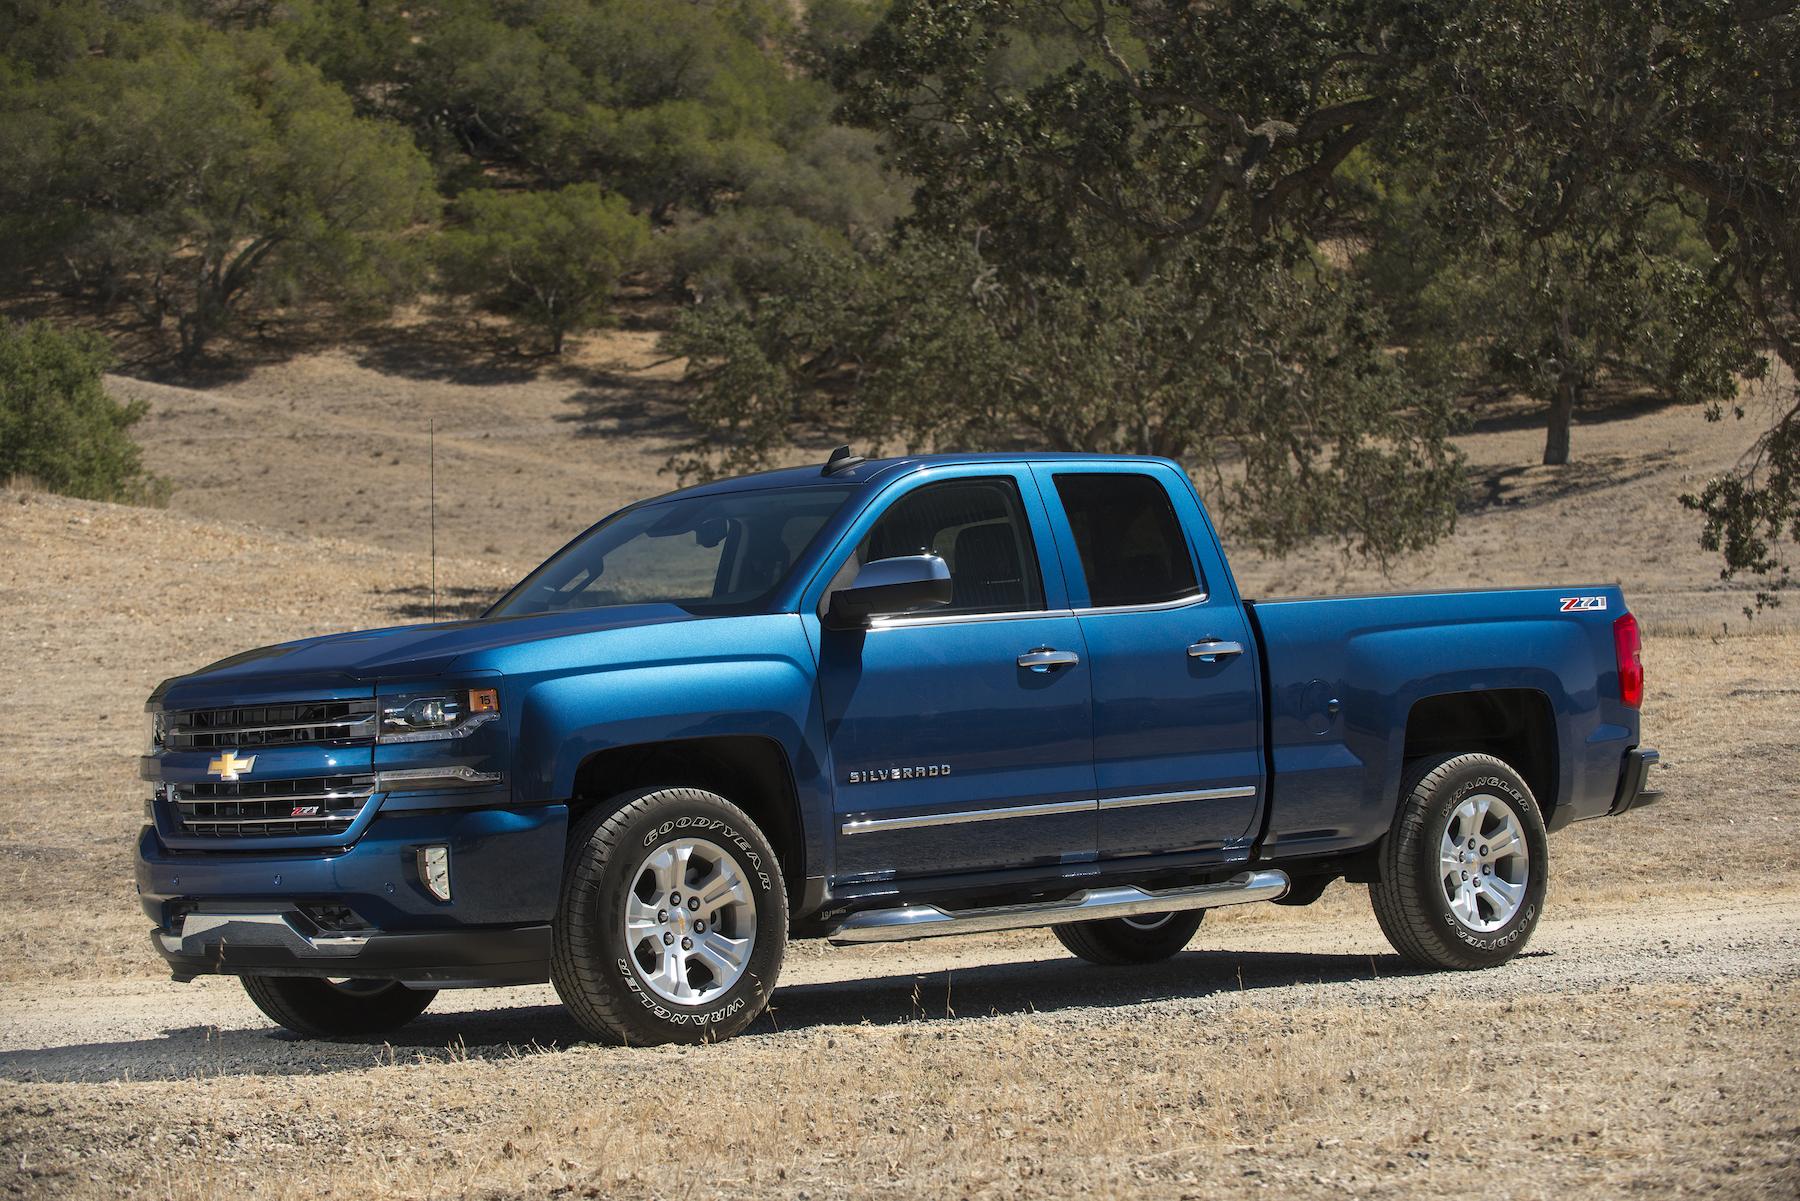 A blue 2018 Chevrolet Silverado, a full-size pickup truck.